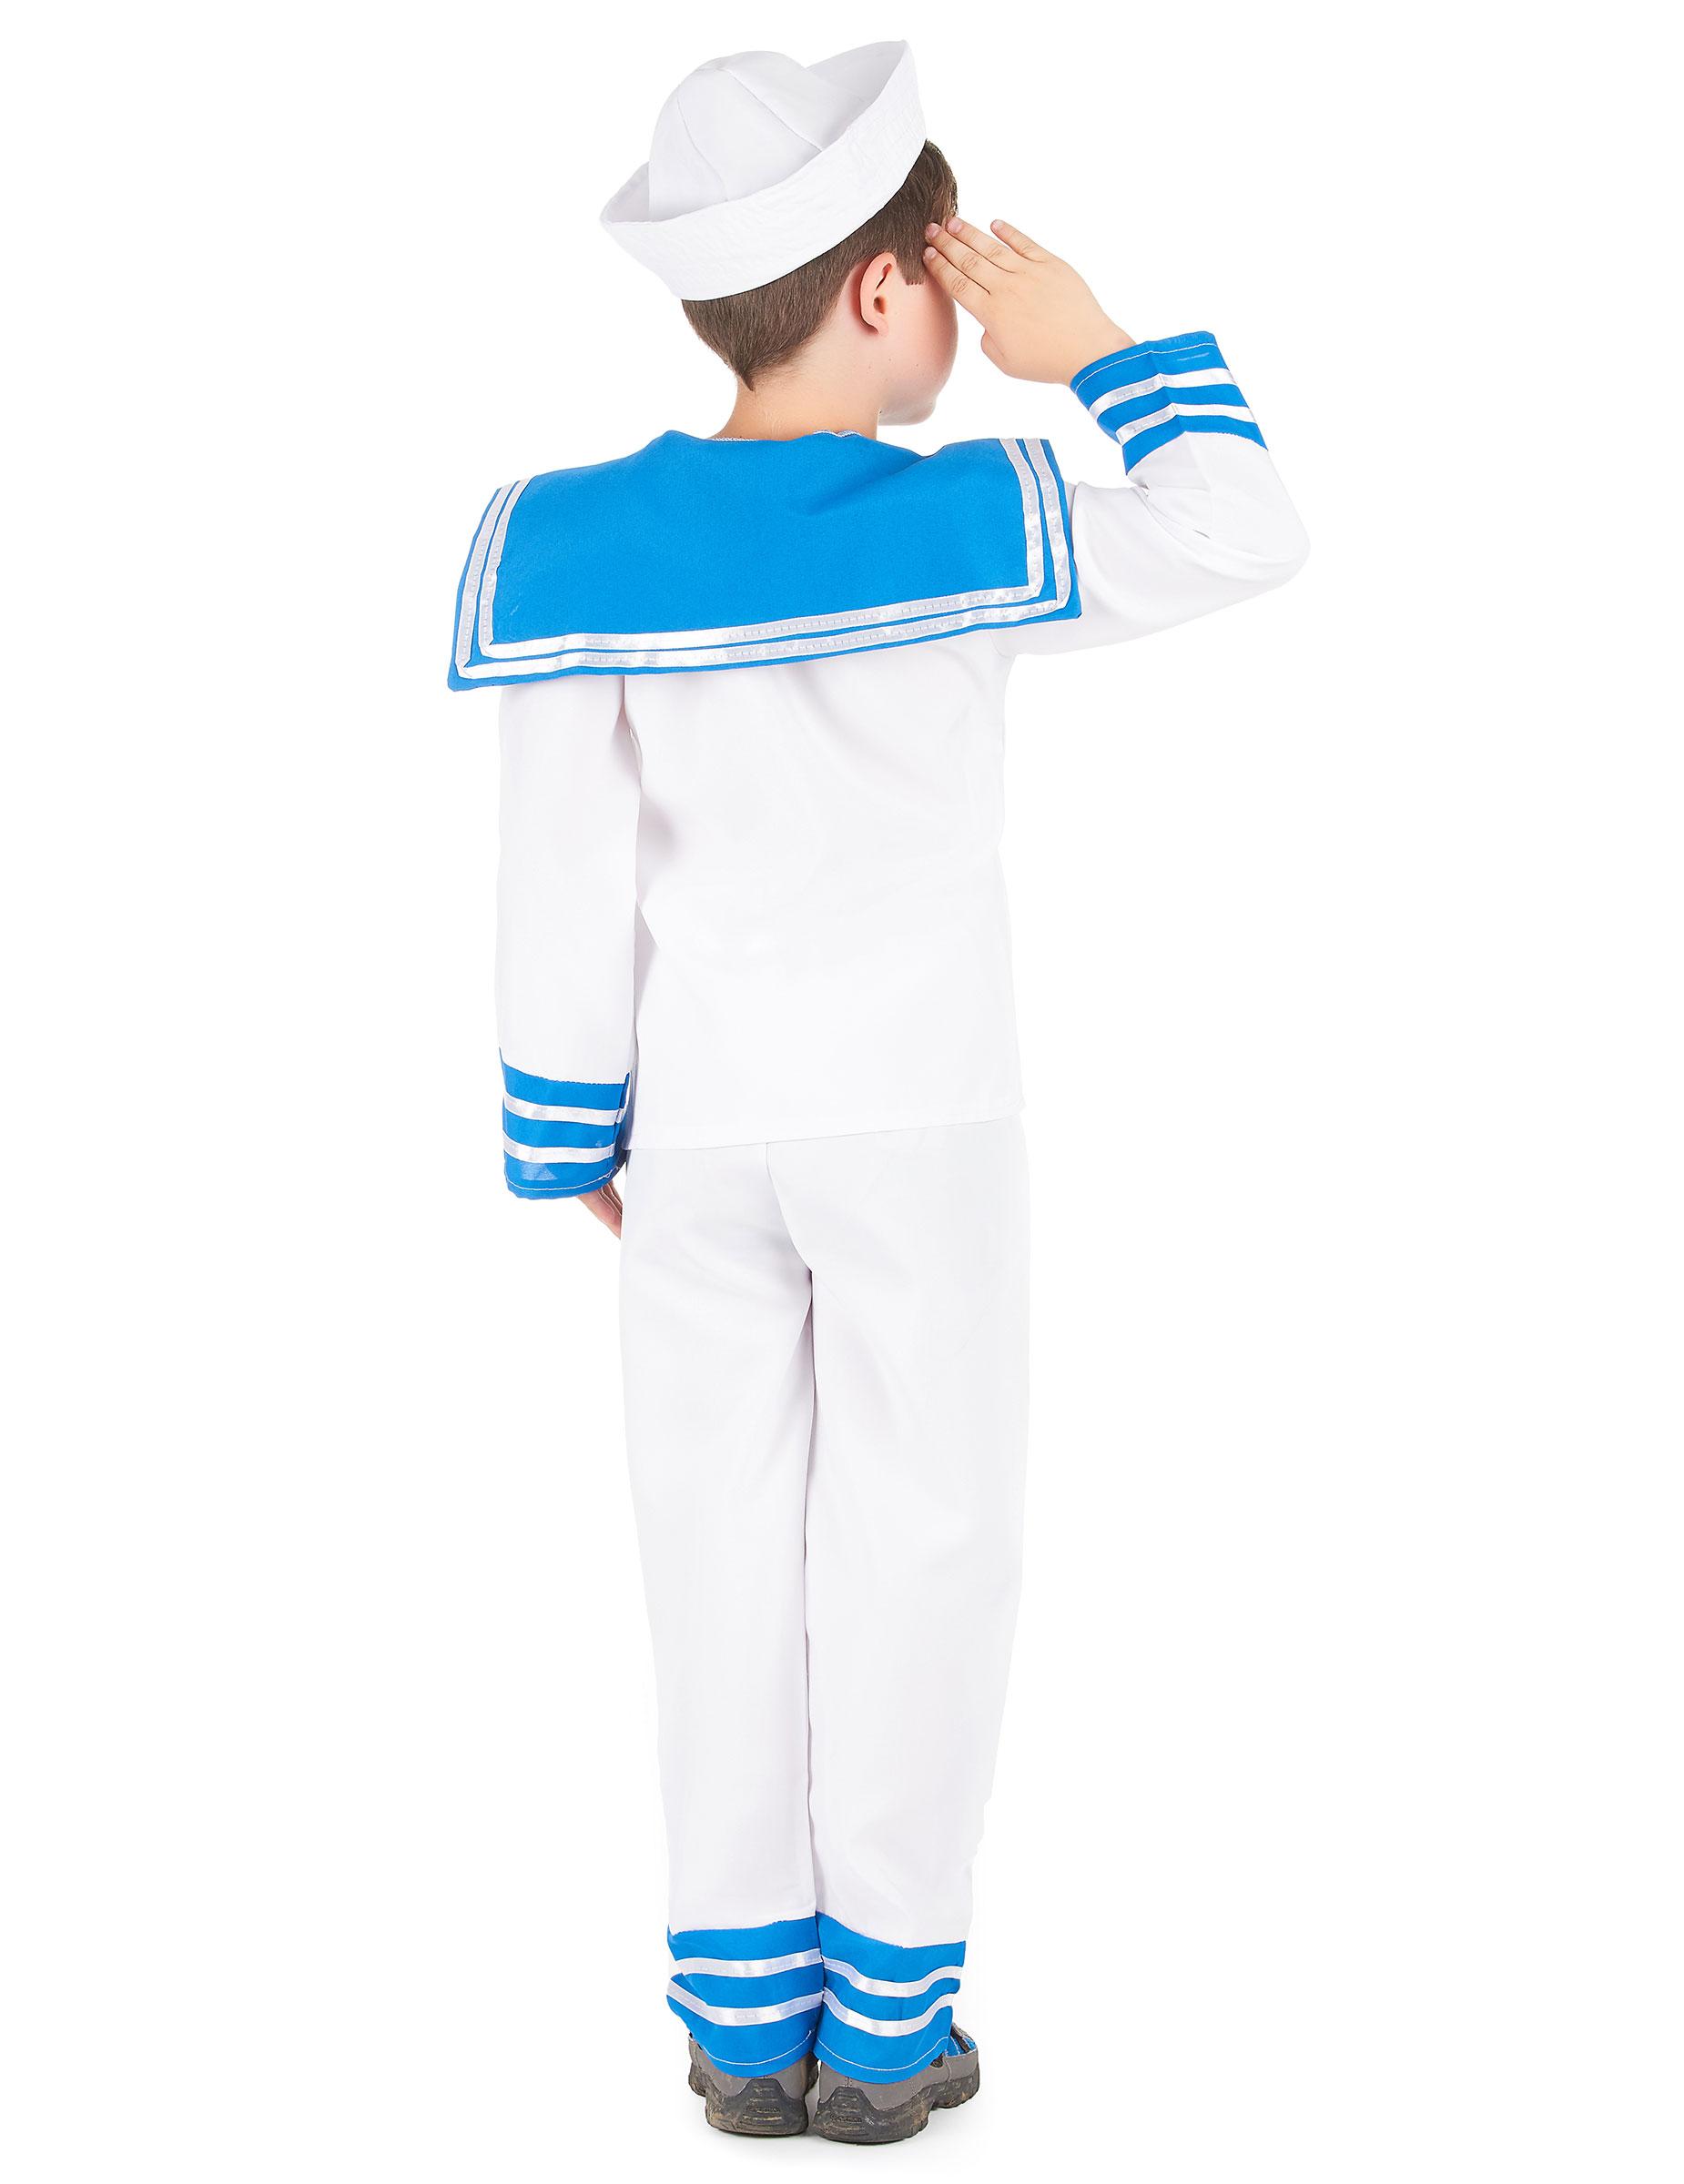 86f7b69b8a4b9 Déguisement marin bleu et blanc garçon : Deguise-toi, achat de ...